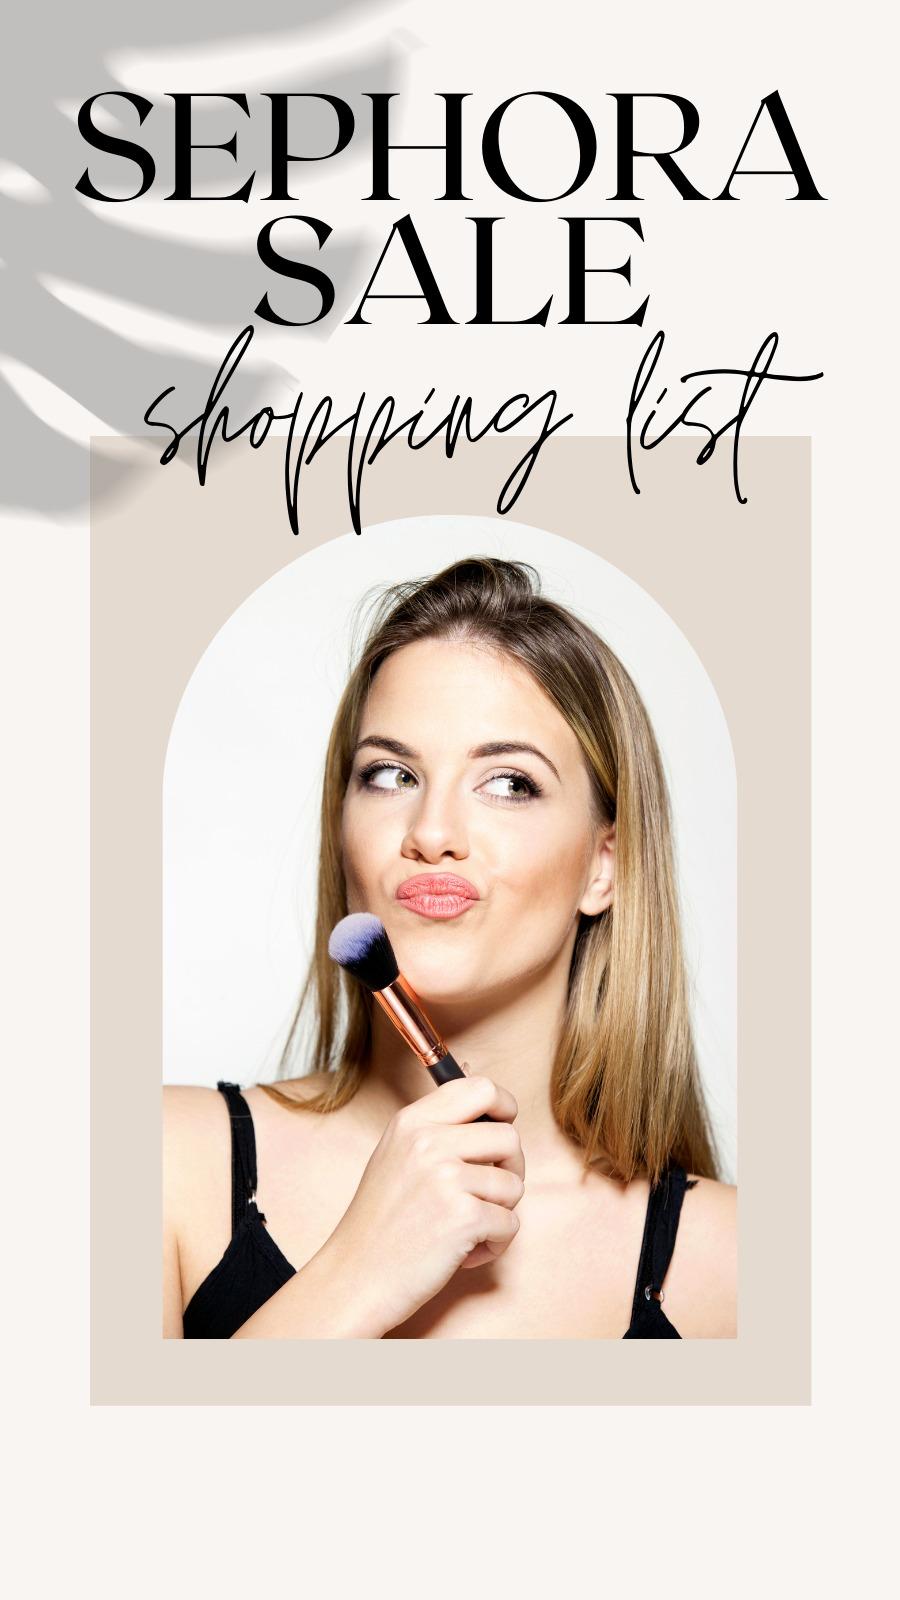 Sephora Sale Shopping List